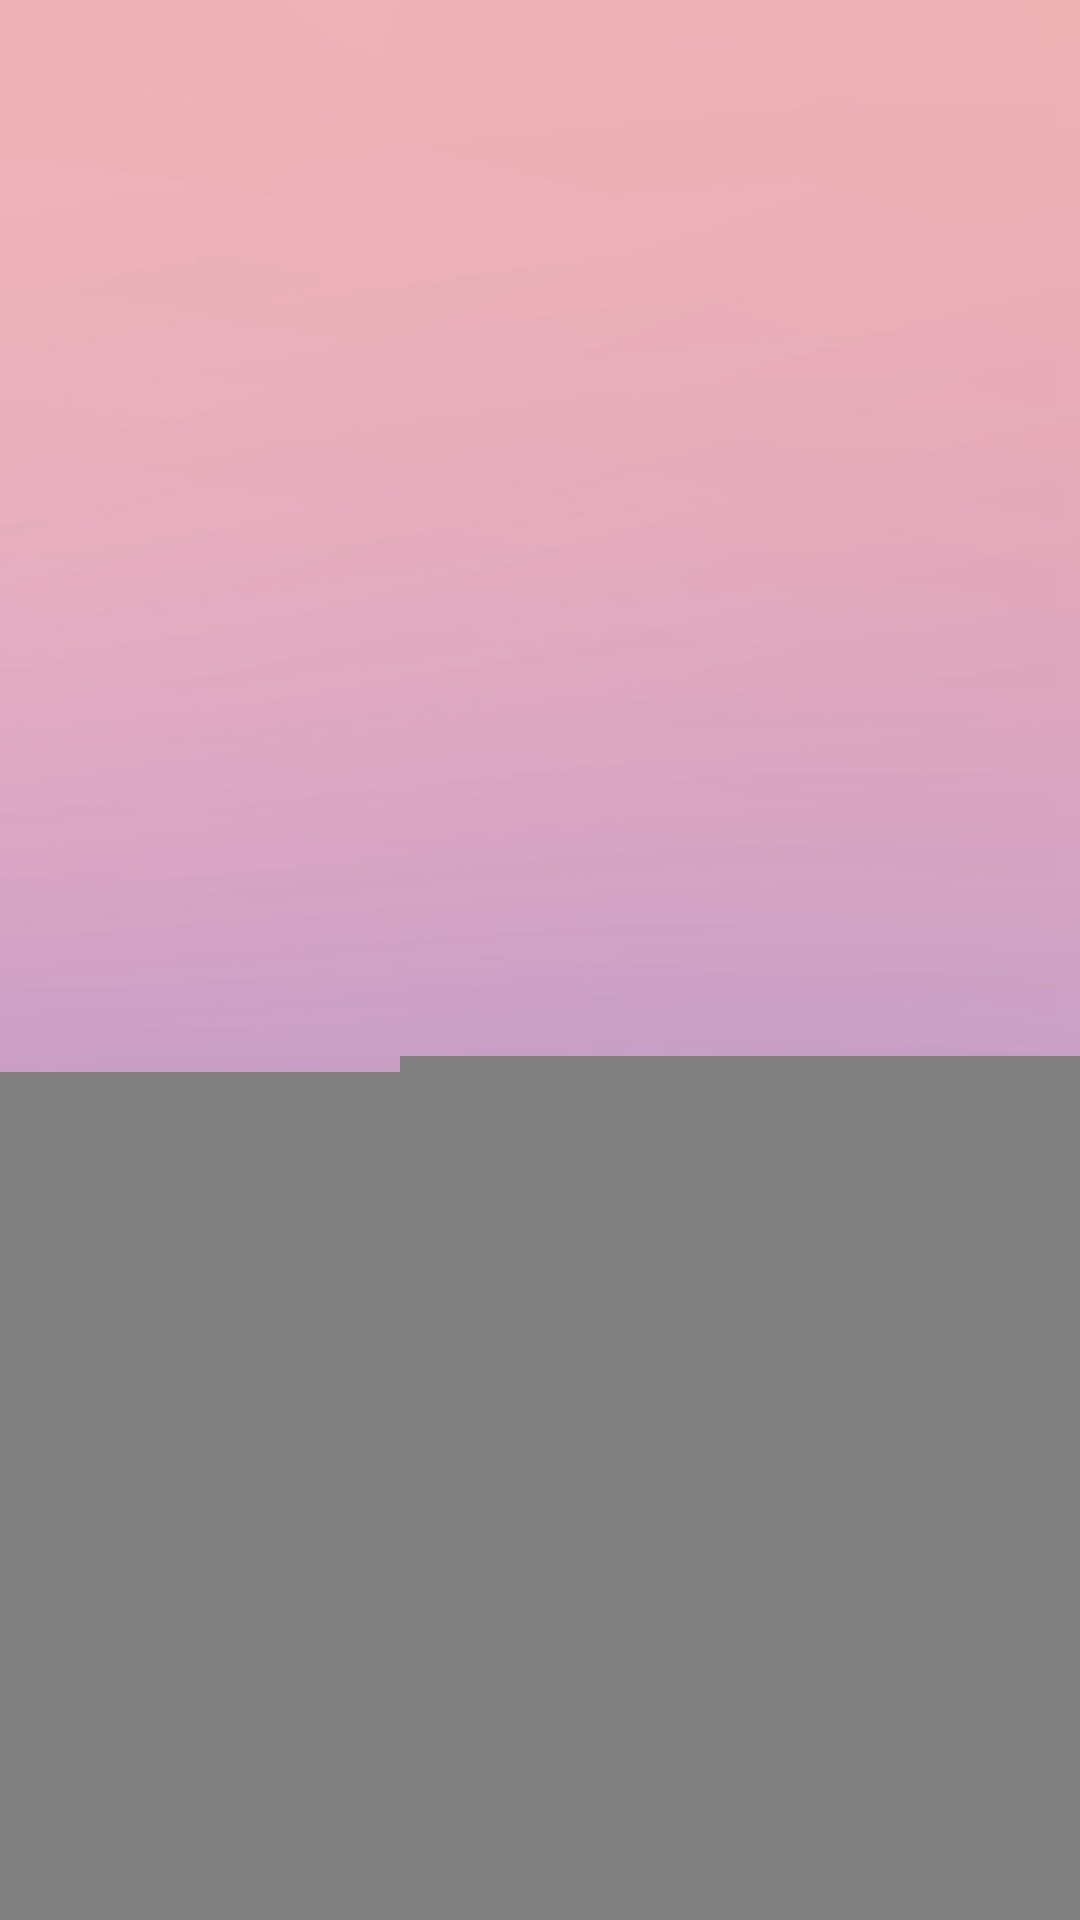 Pink Blue Purple Harmony Gradation Blur iPhone 8 wallpaper